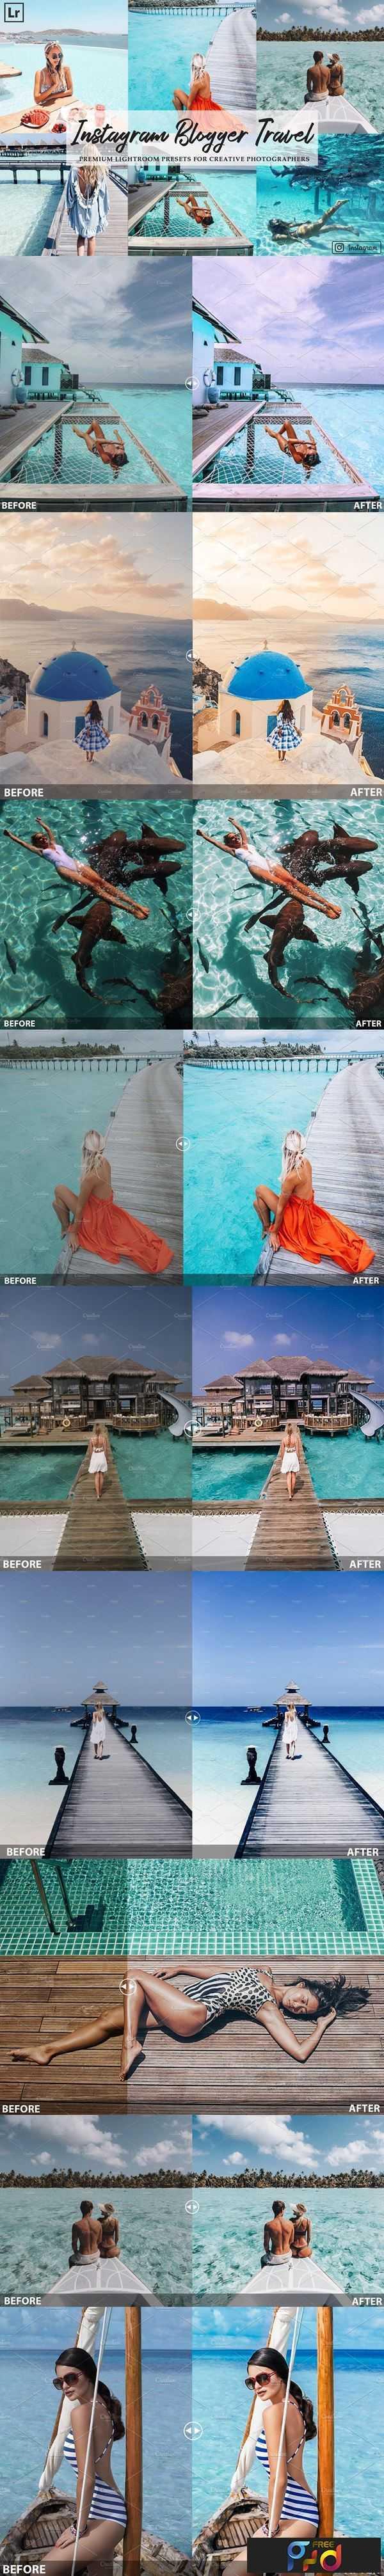 1806295 30 Instagram Blogger Travel Presets 2535917 1